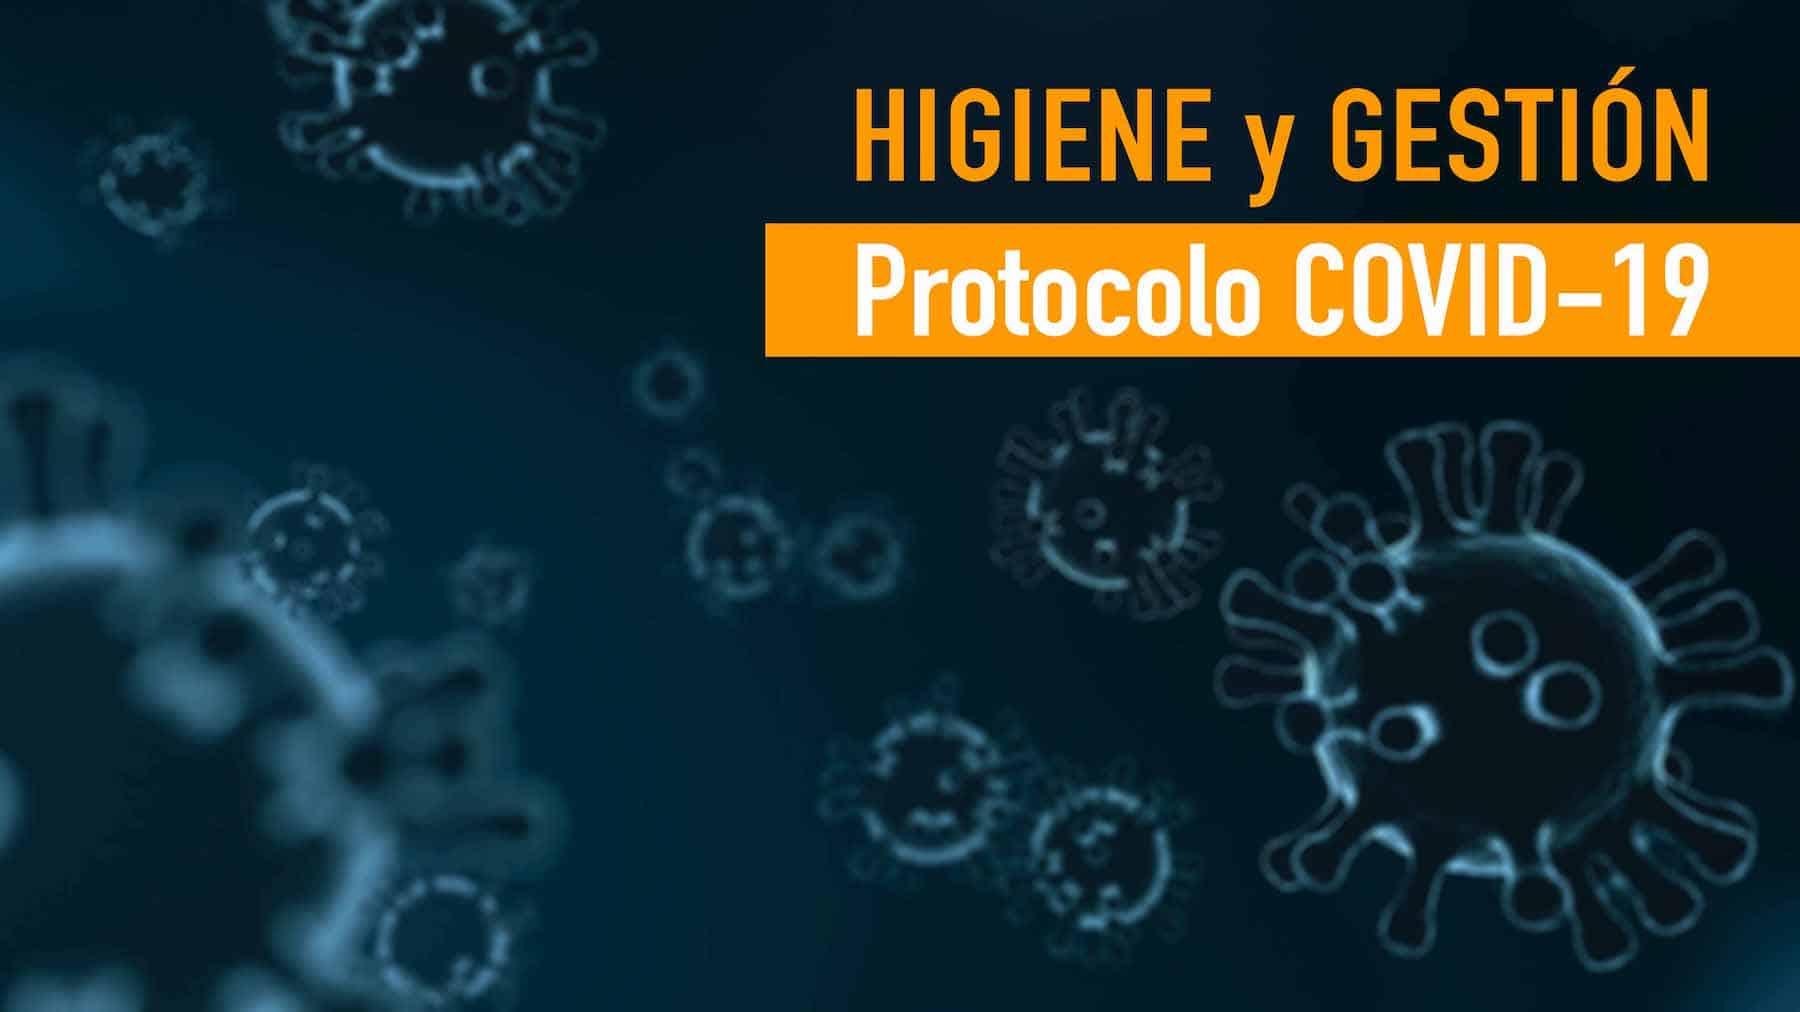 Protocolo manejo del Coronavirus (Covid-19) post-cuarentena.